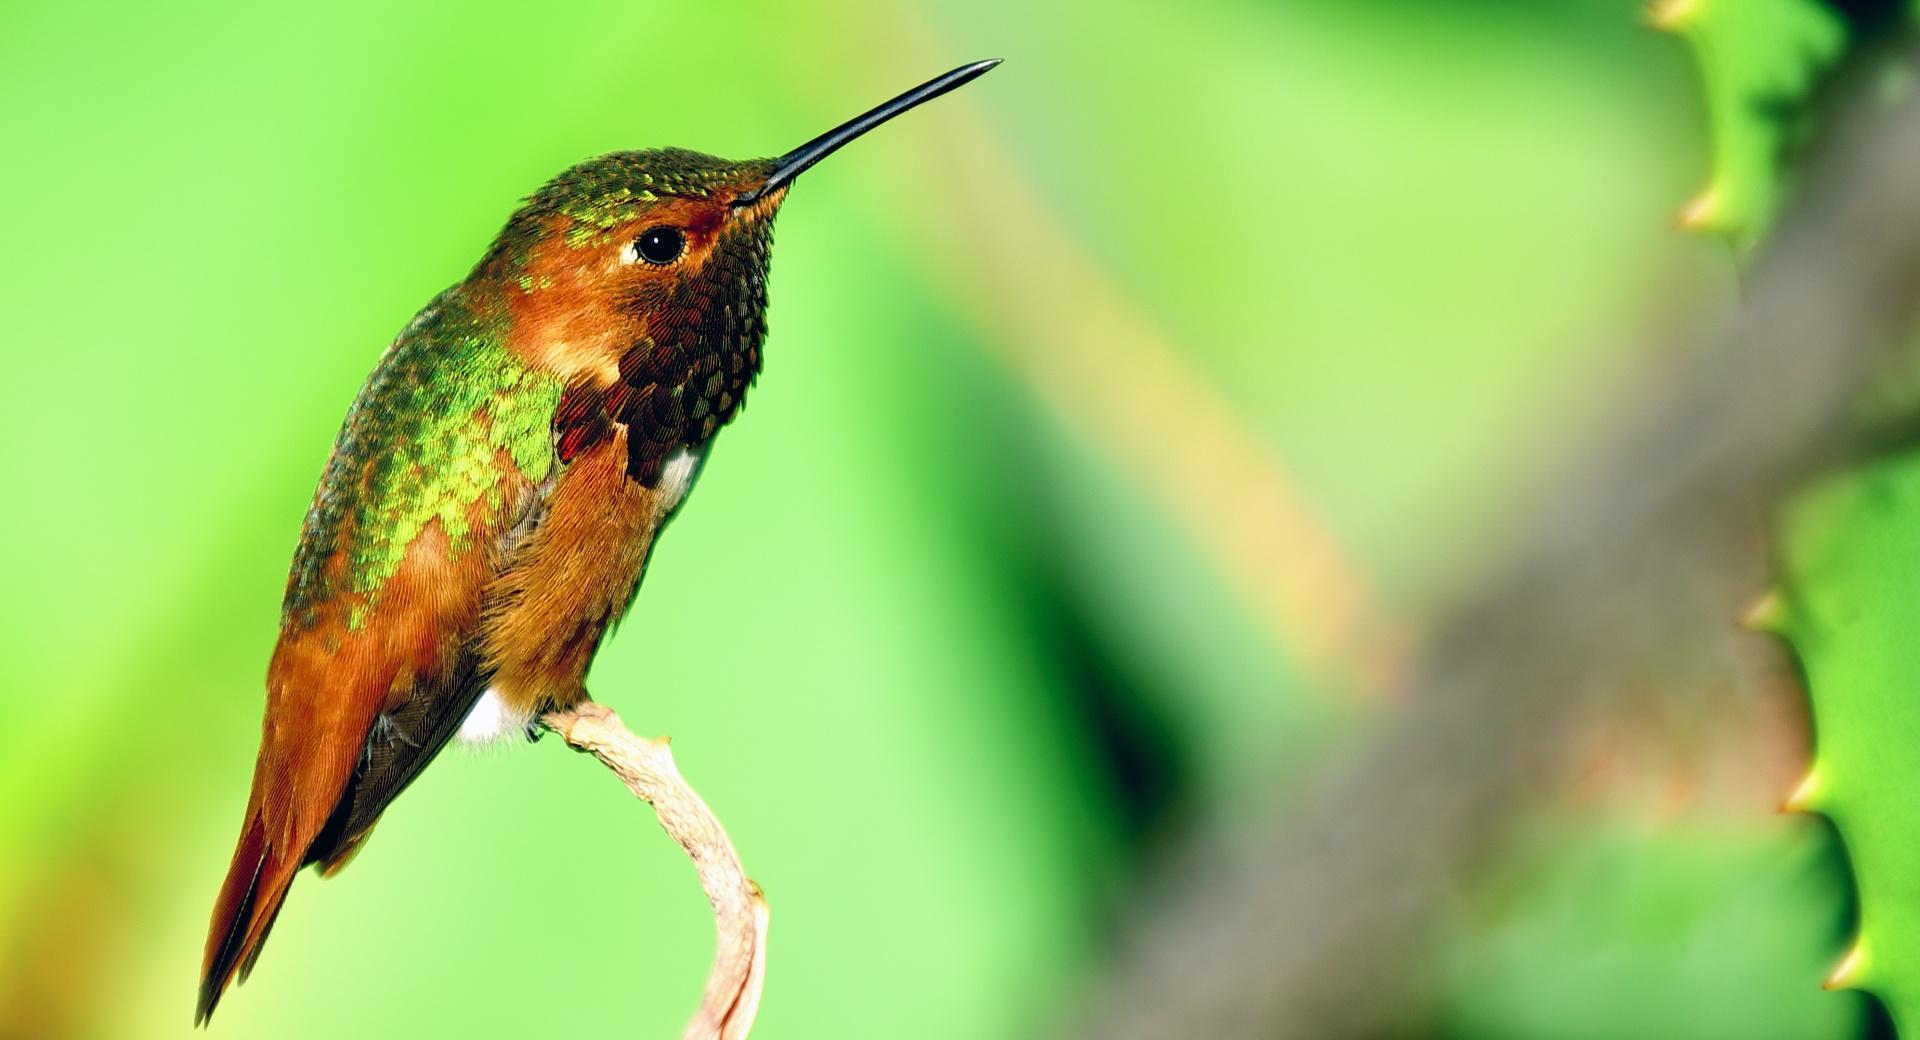 Hummingbird Resting wallpapers HD quality